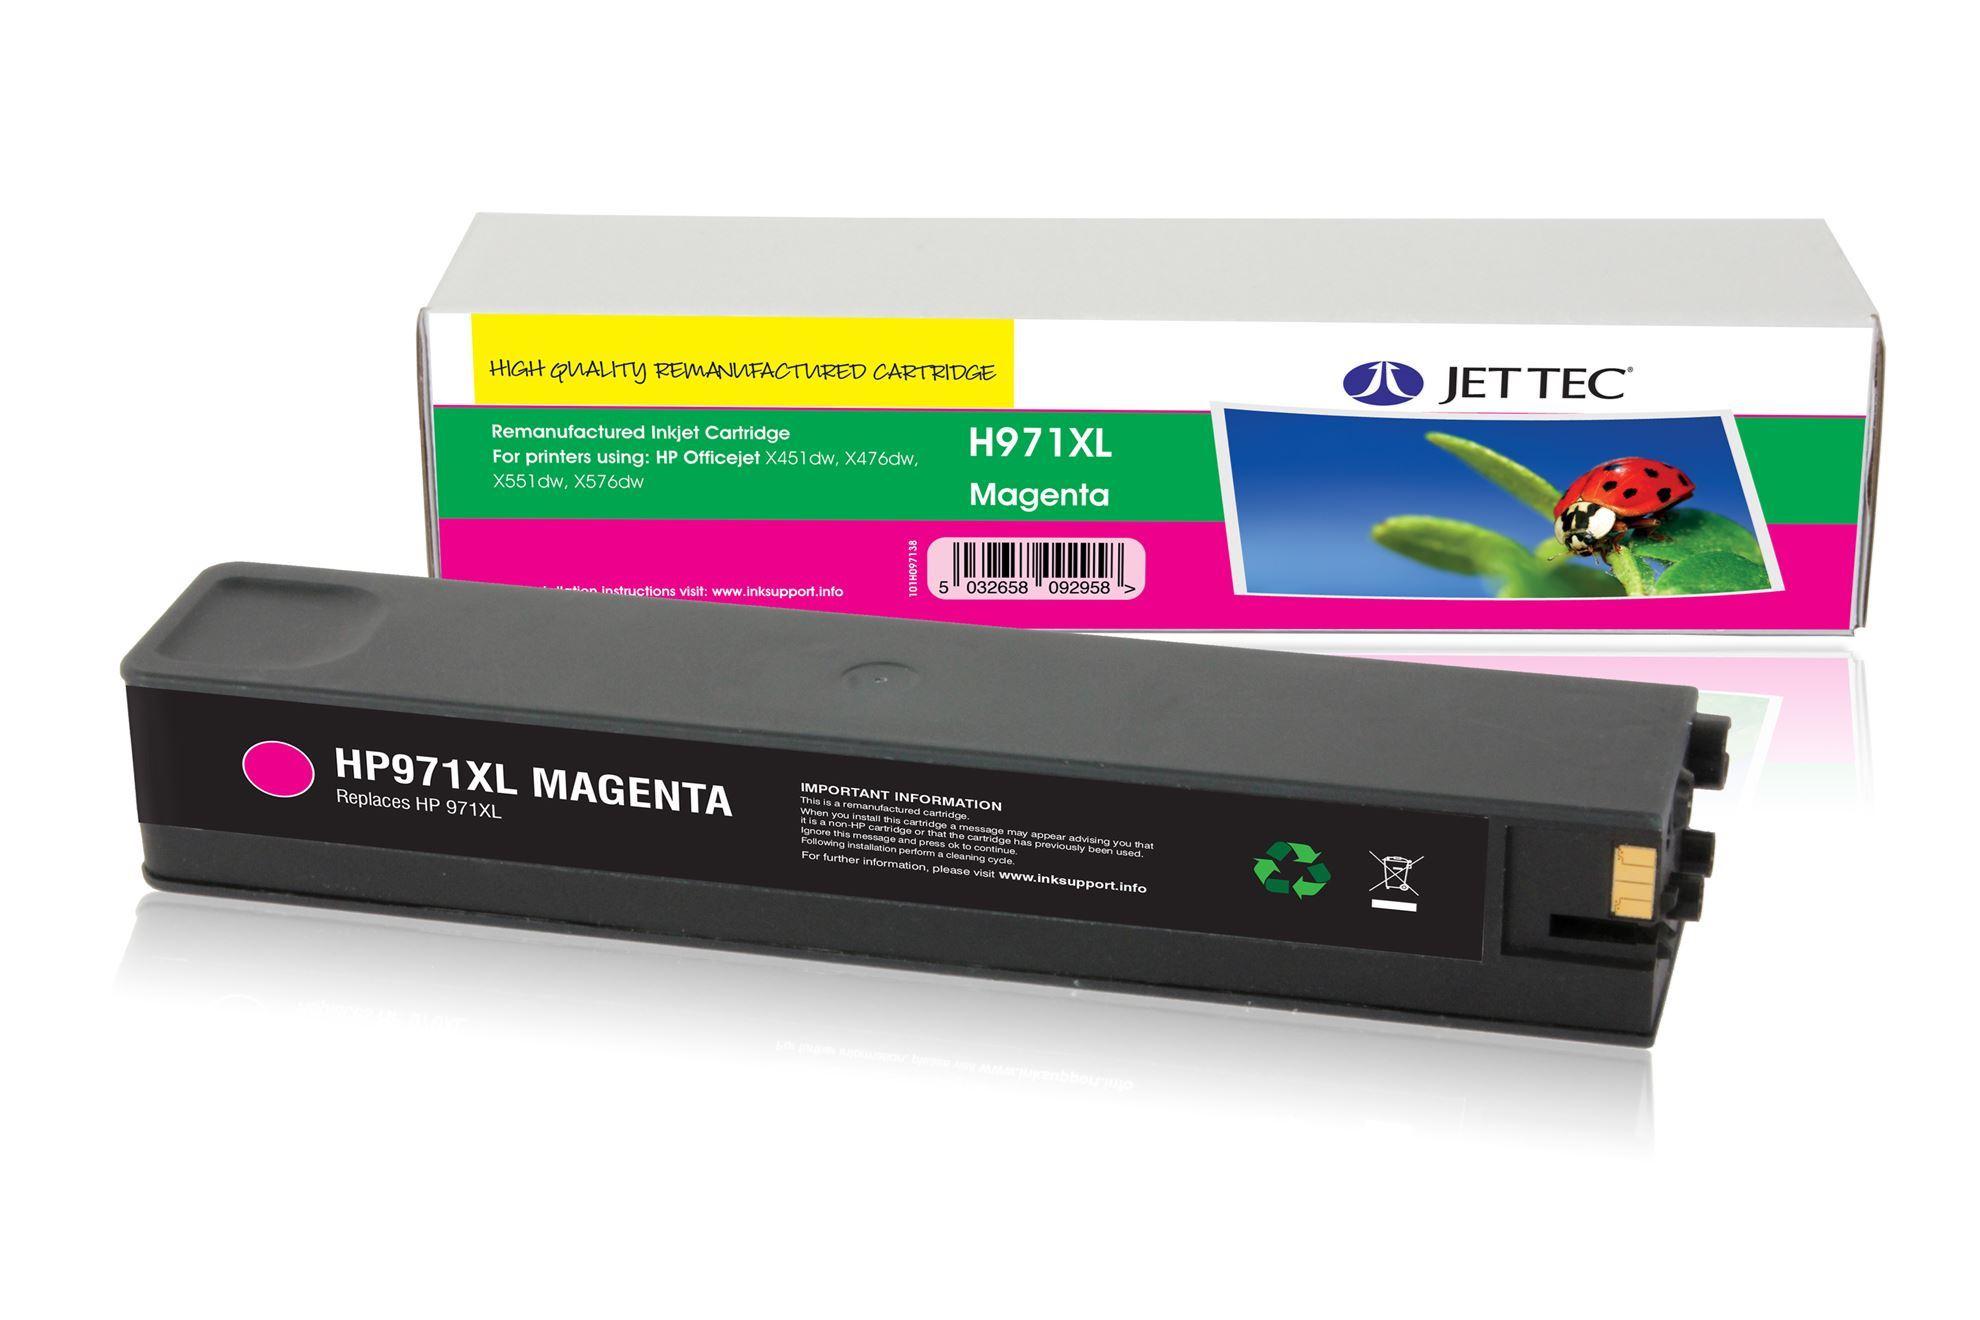 HP971XL Magenta